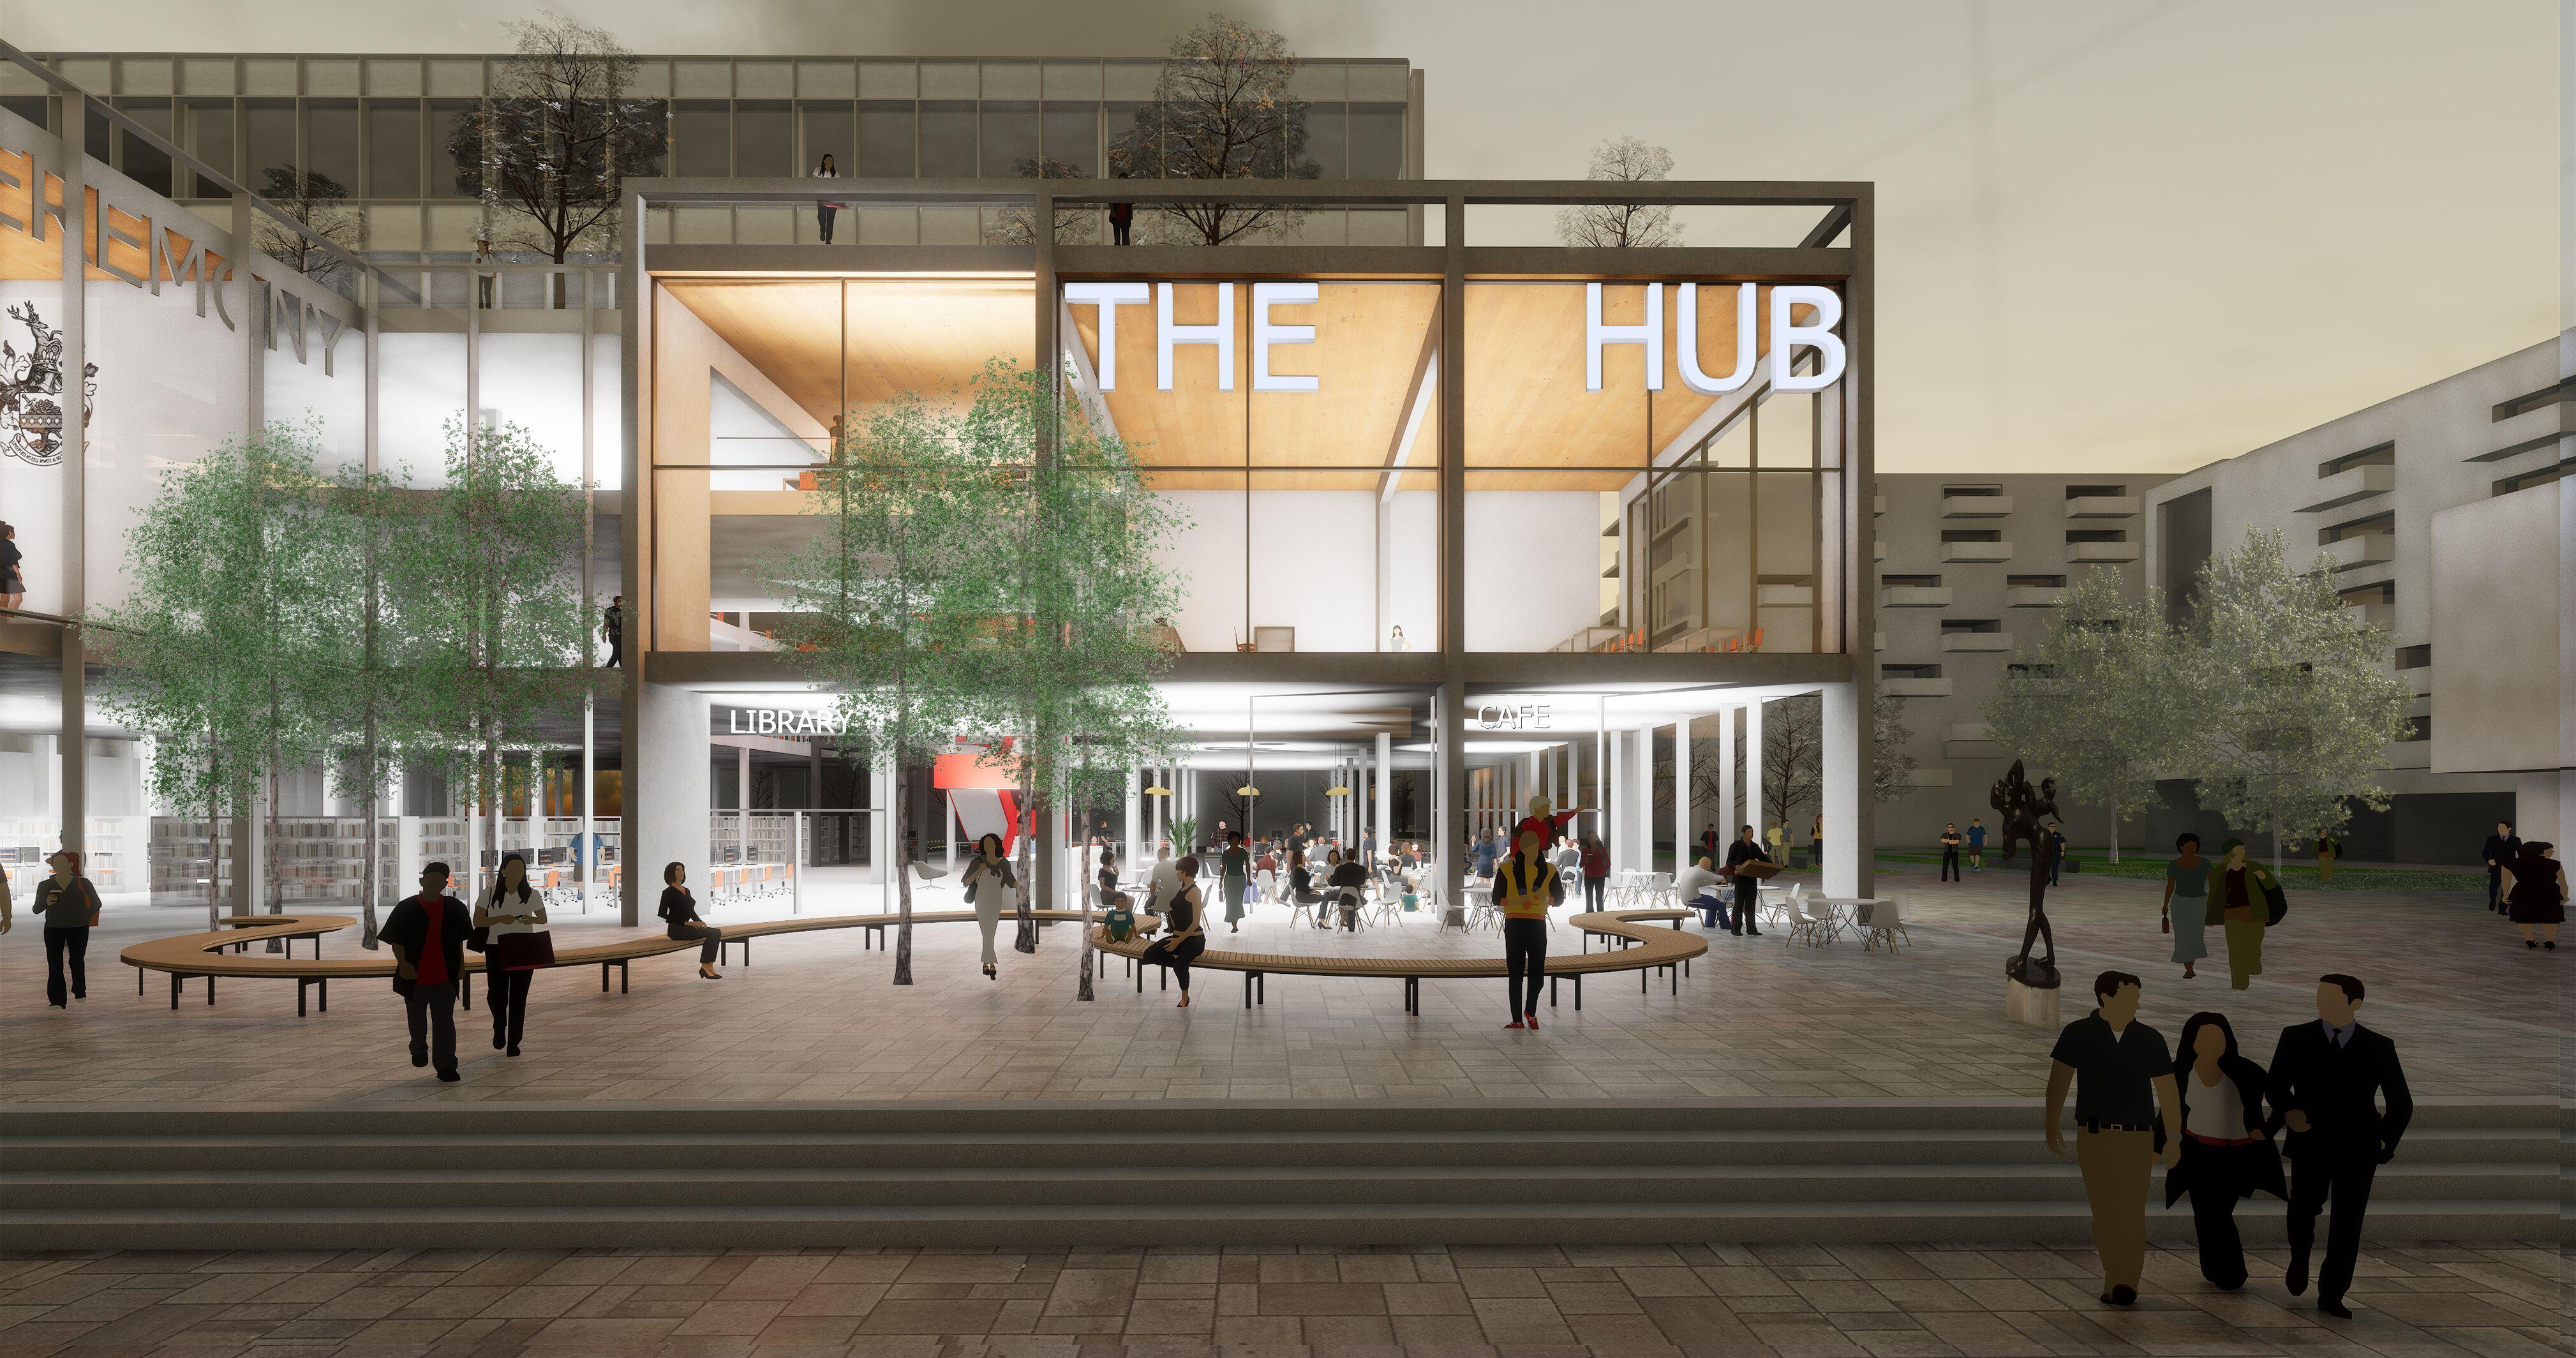 Garden Square/The Hub